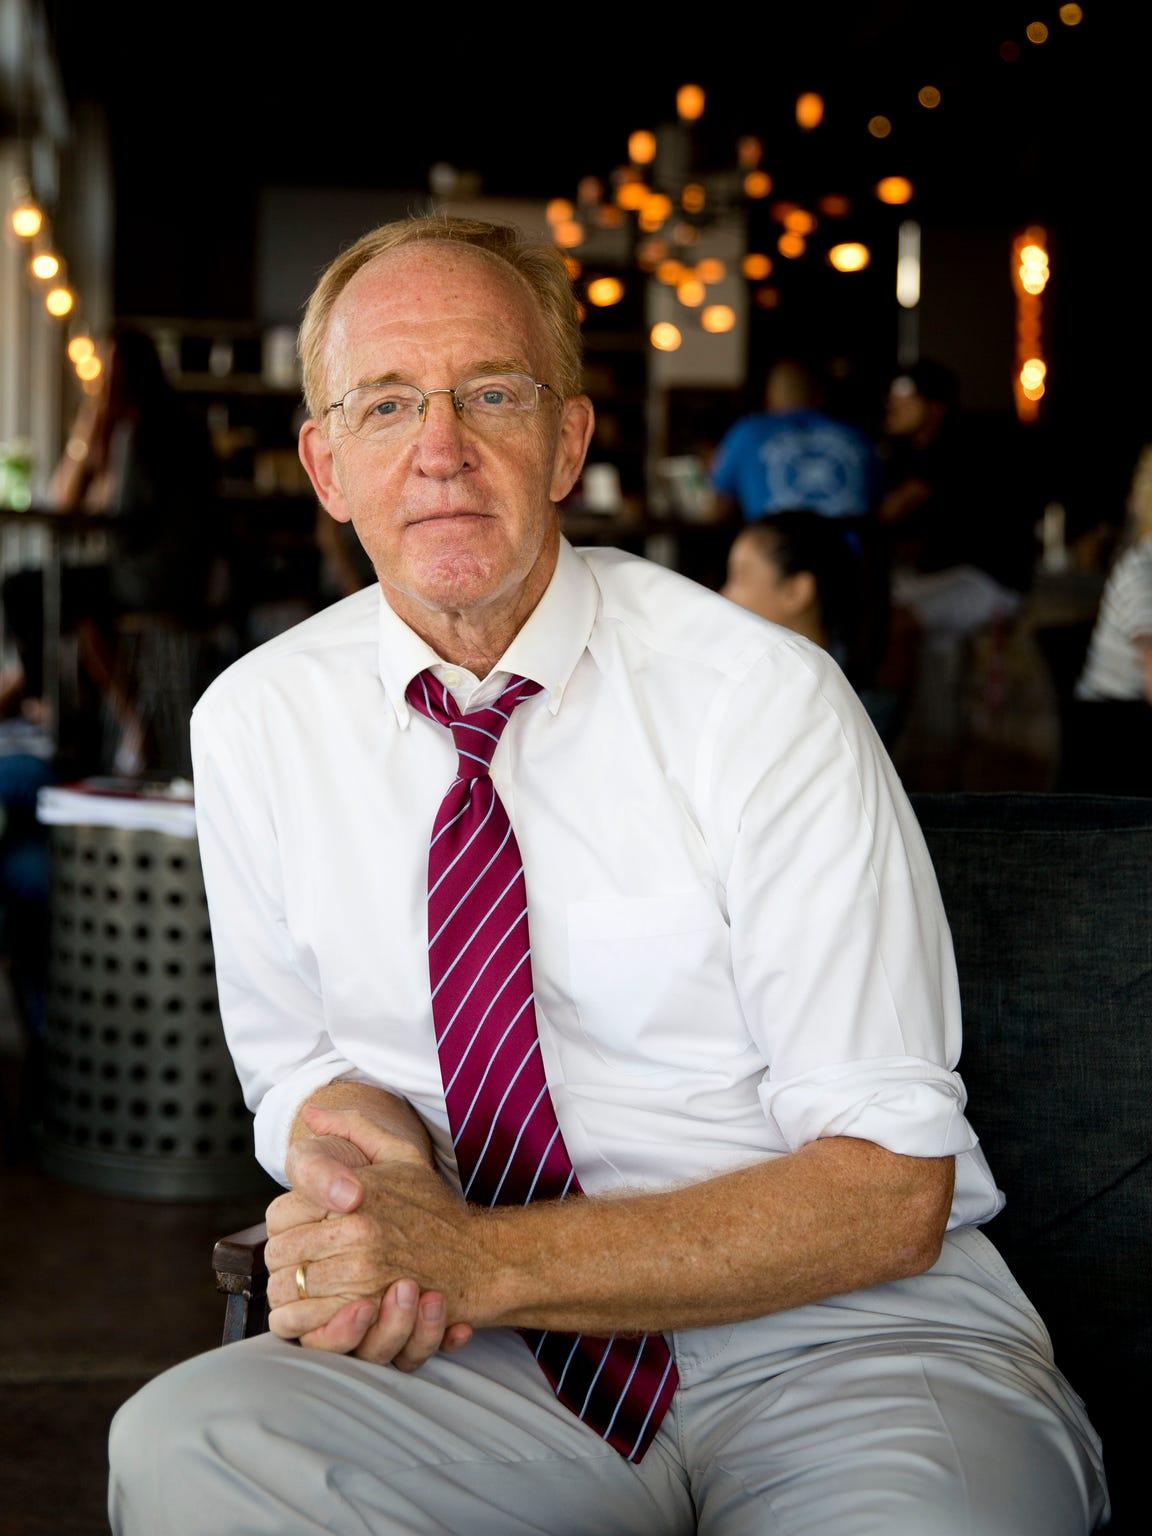 Jonathan Sobin, 65, a clinical psychologist living